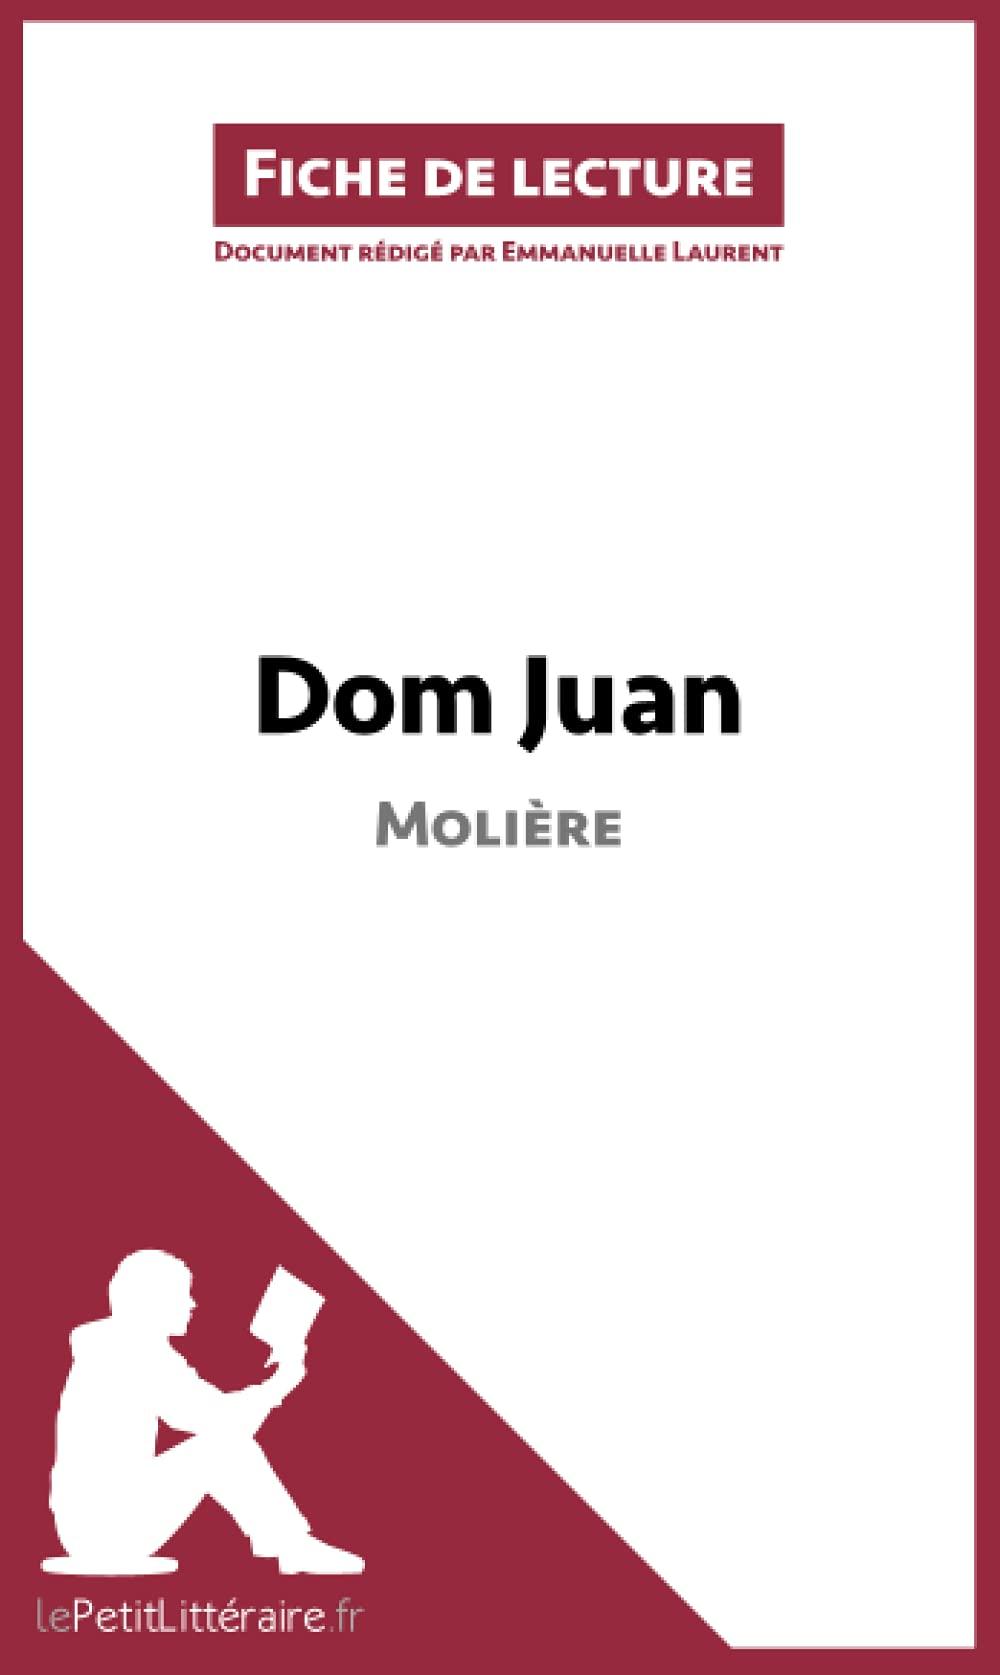 Resume livre dom juan moliere psychology manuscript cover letter